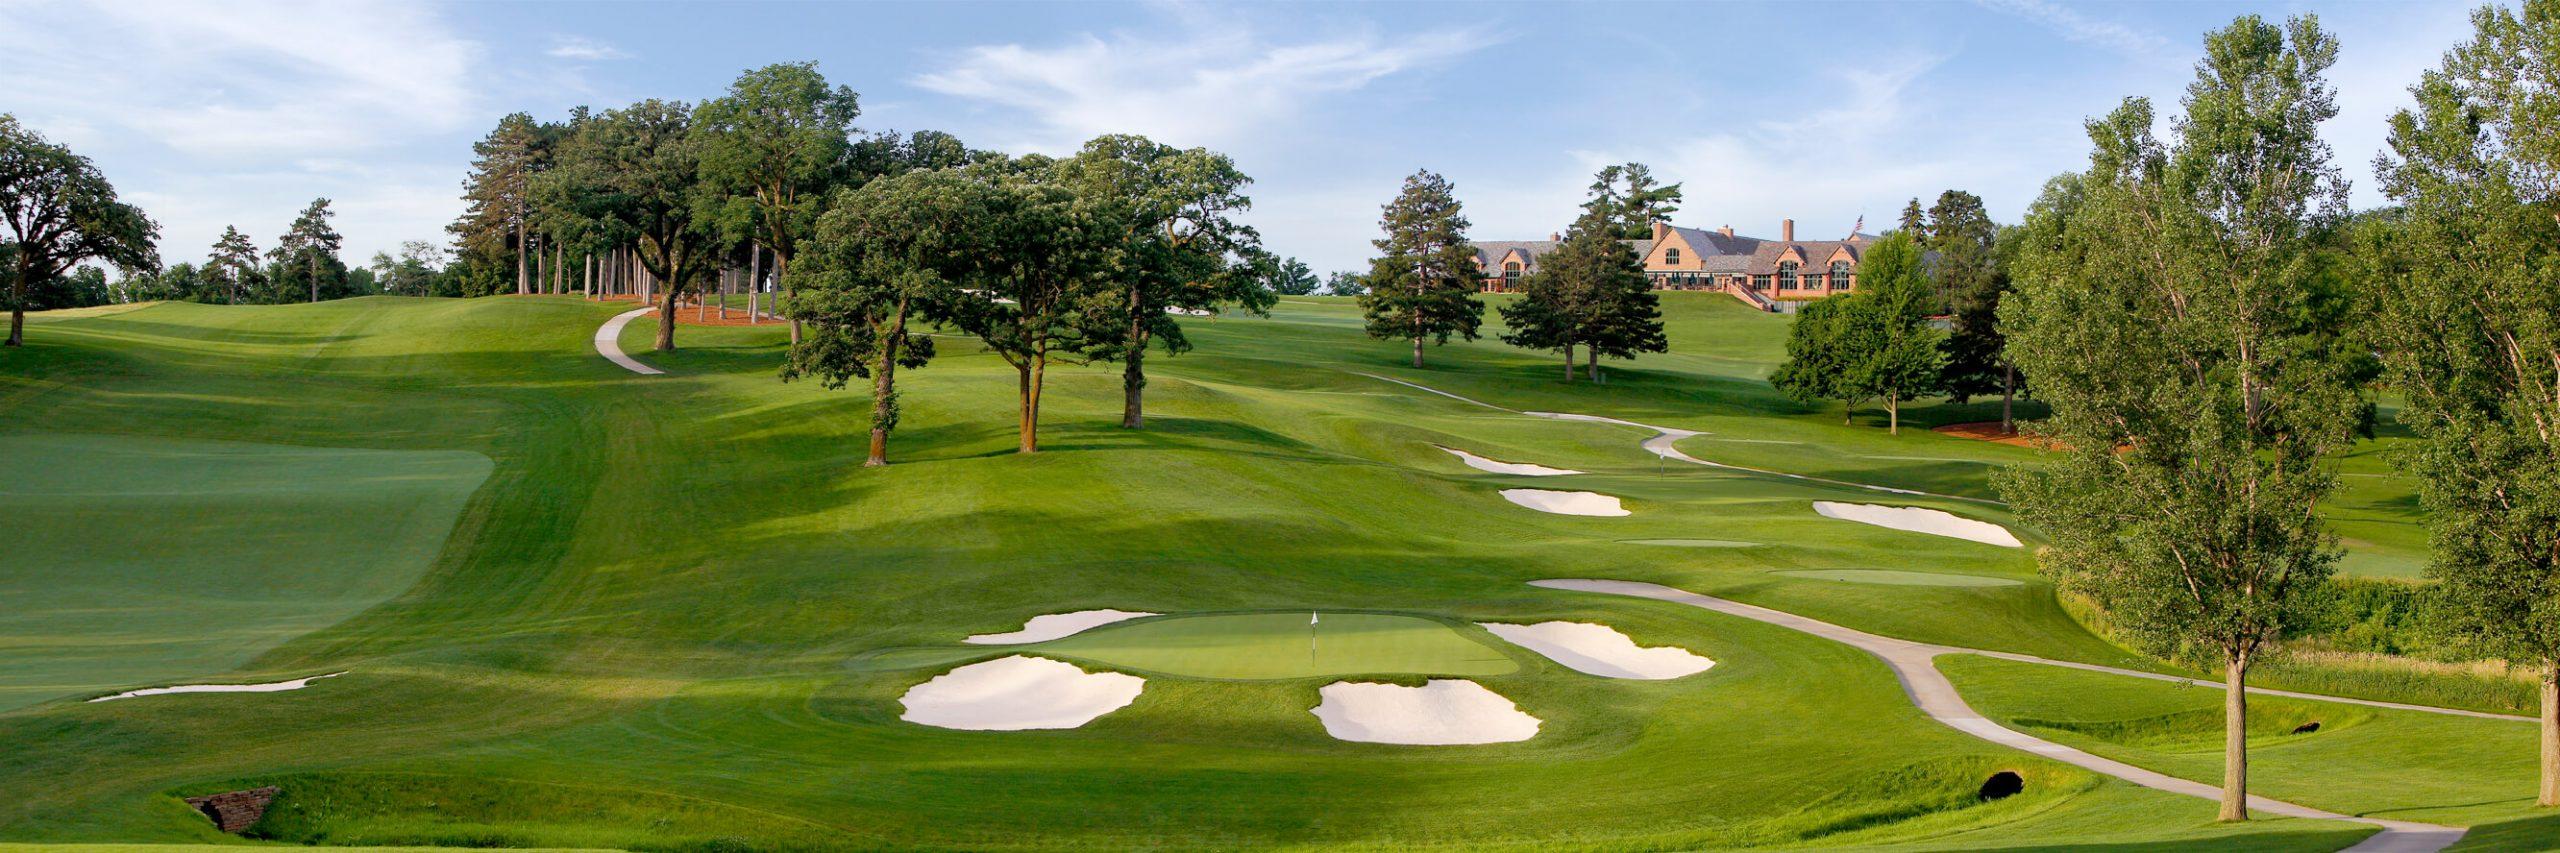 Golf Course Image - Omaha Country Club No. 11